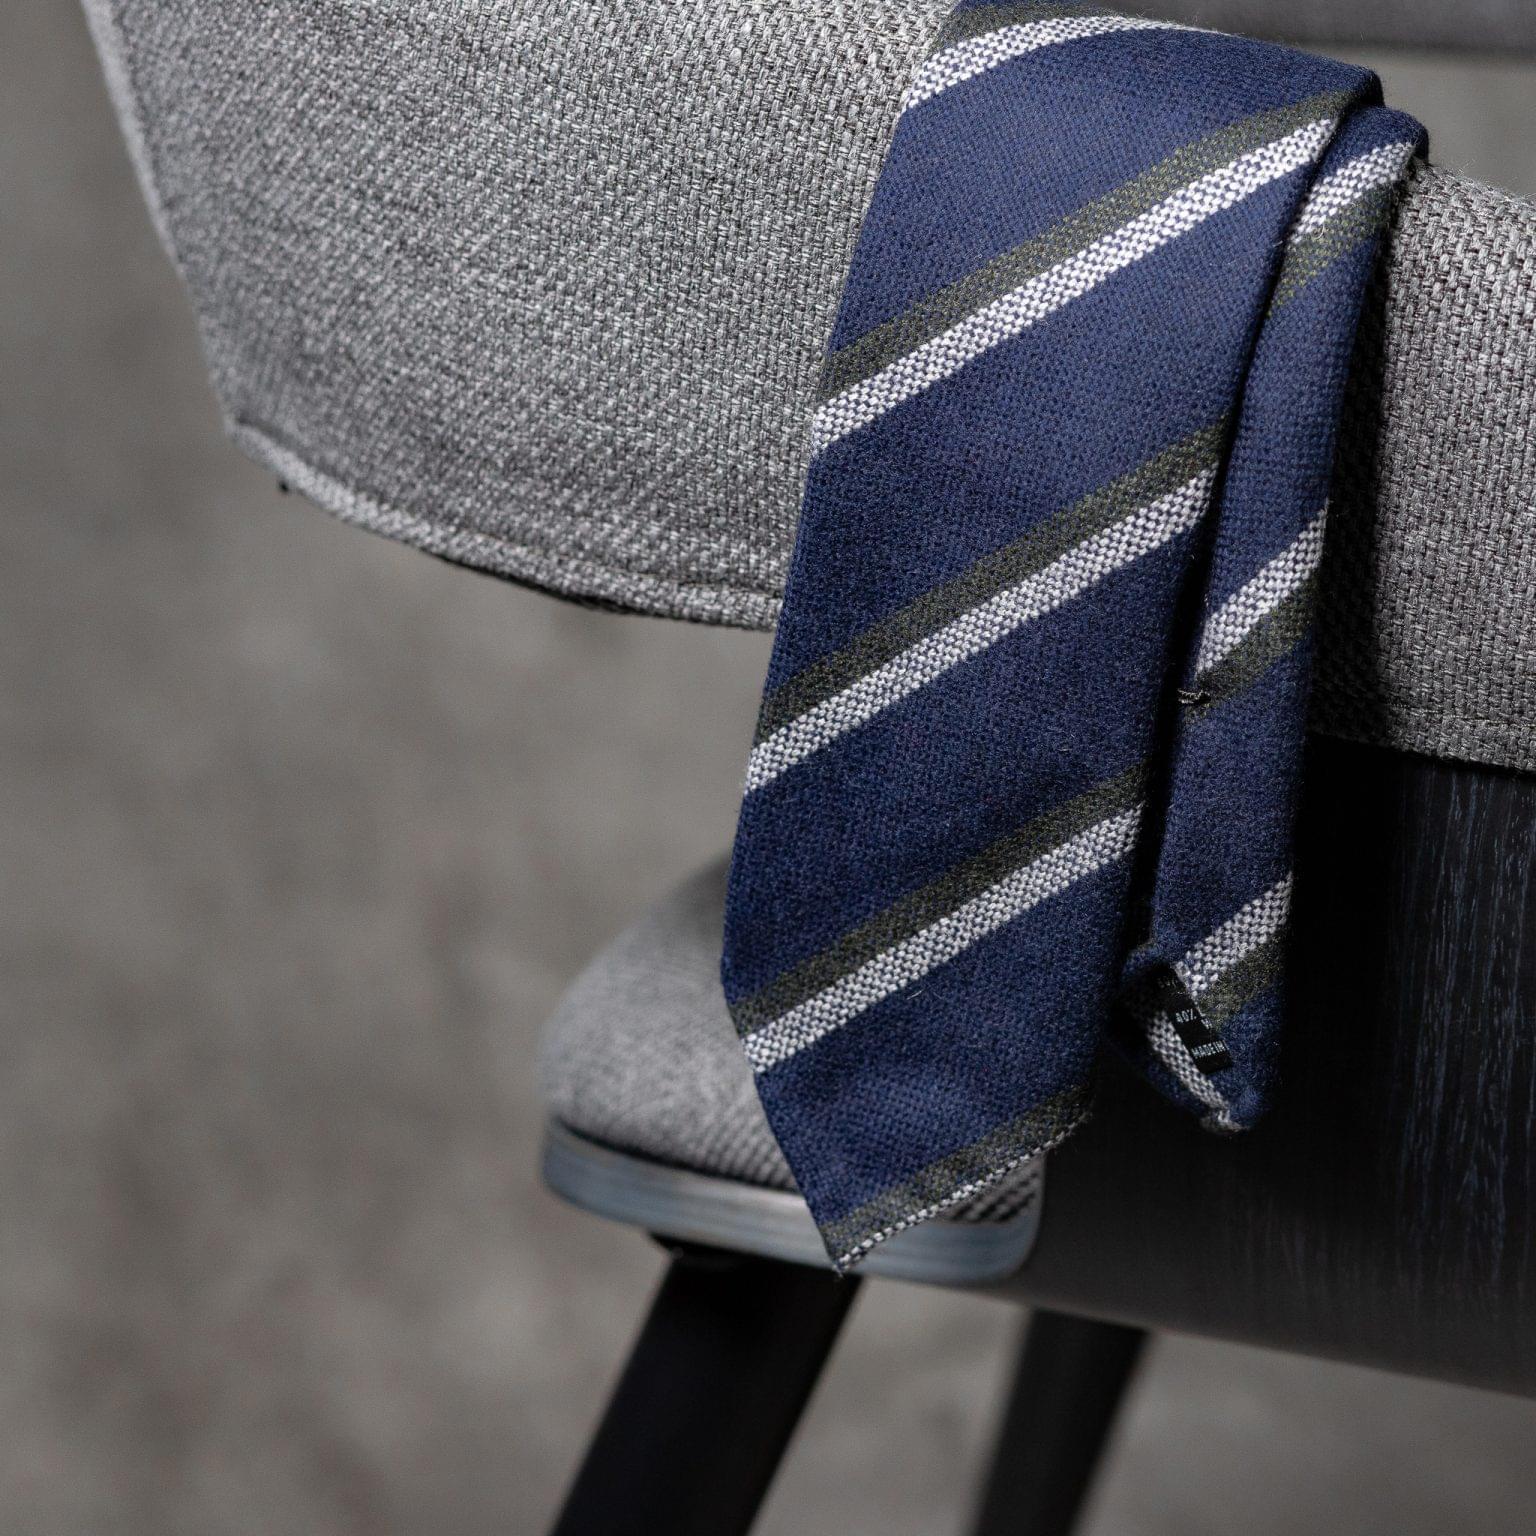 WOOL-LANA-0514-Tie-Initials-Corbata-Iniciales-The-Seelk-2